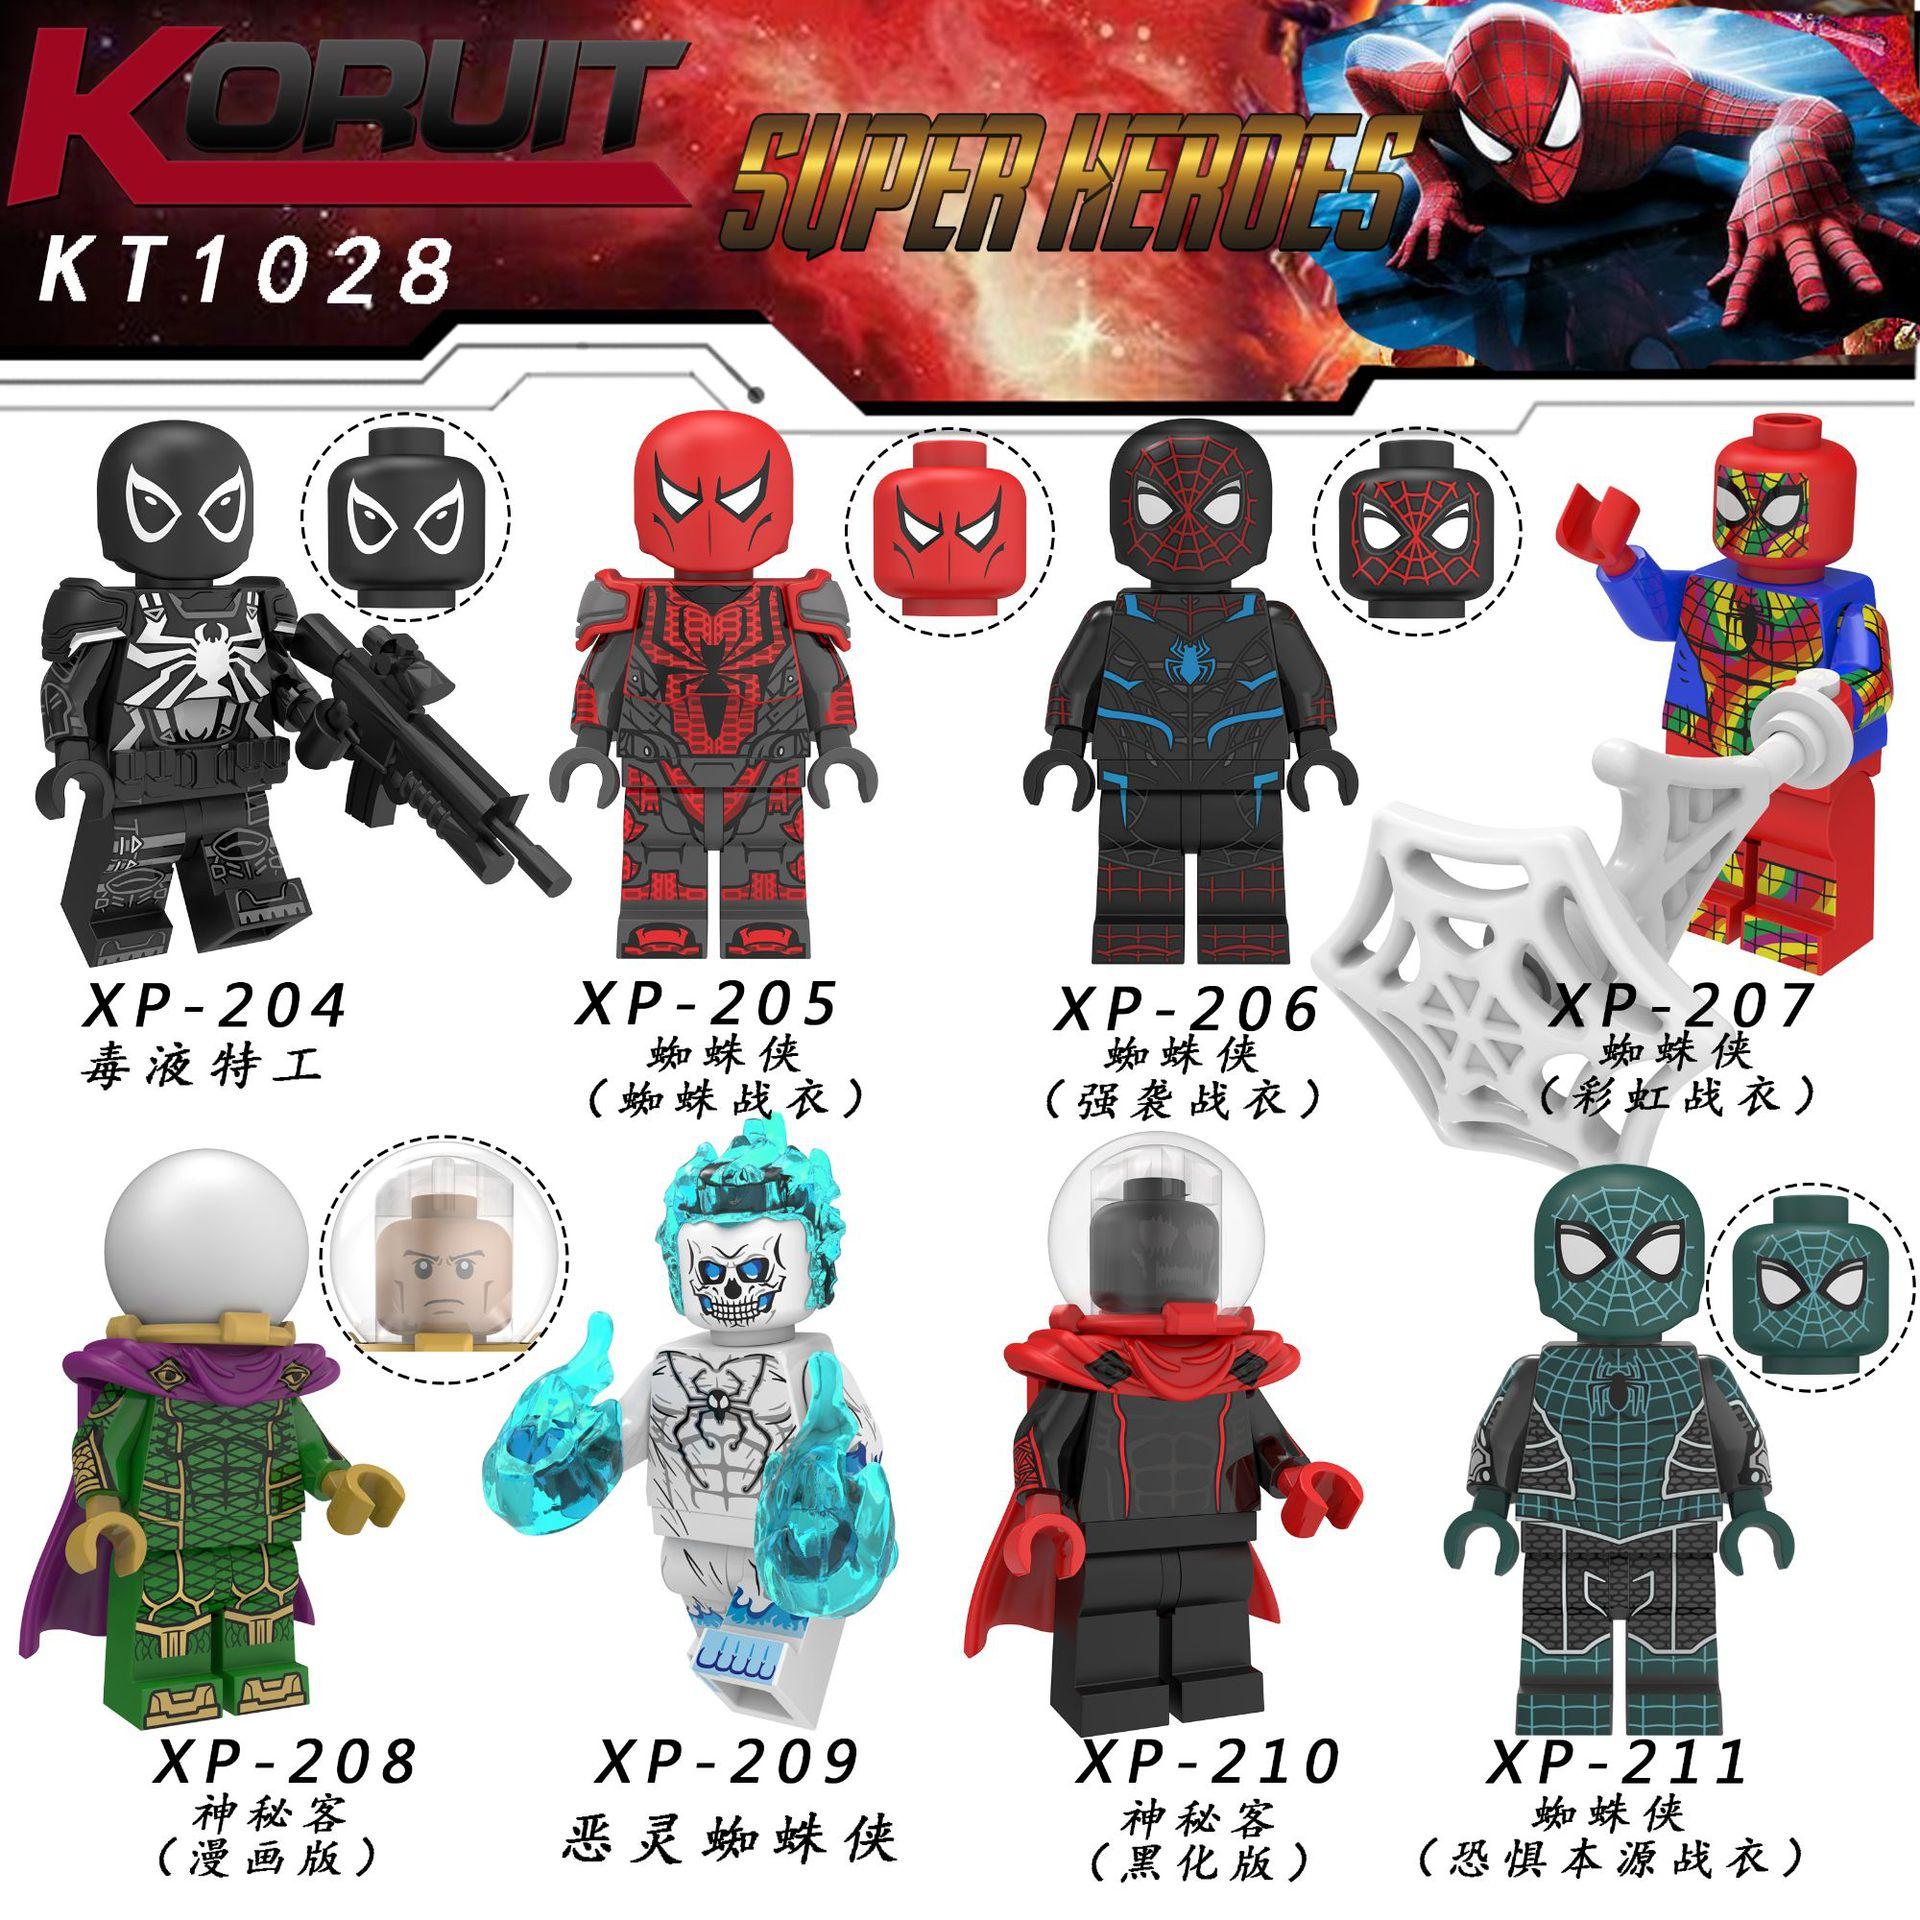 80pcs KT1028 Spider Man ของเล่นบล็อก Far From Home Mysterio Happy Hogan Peter Parker Agent Venom Building Blocks ของขวัญสำหรับเด็ก-ใน บล็อก จาก ของเล่นและงานอดิเรก บน   1